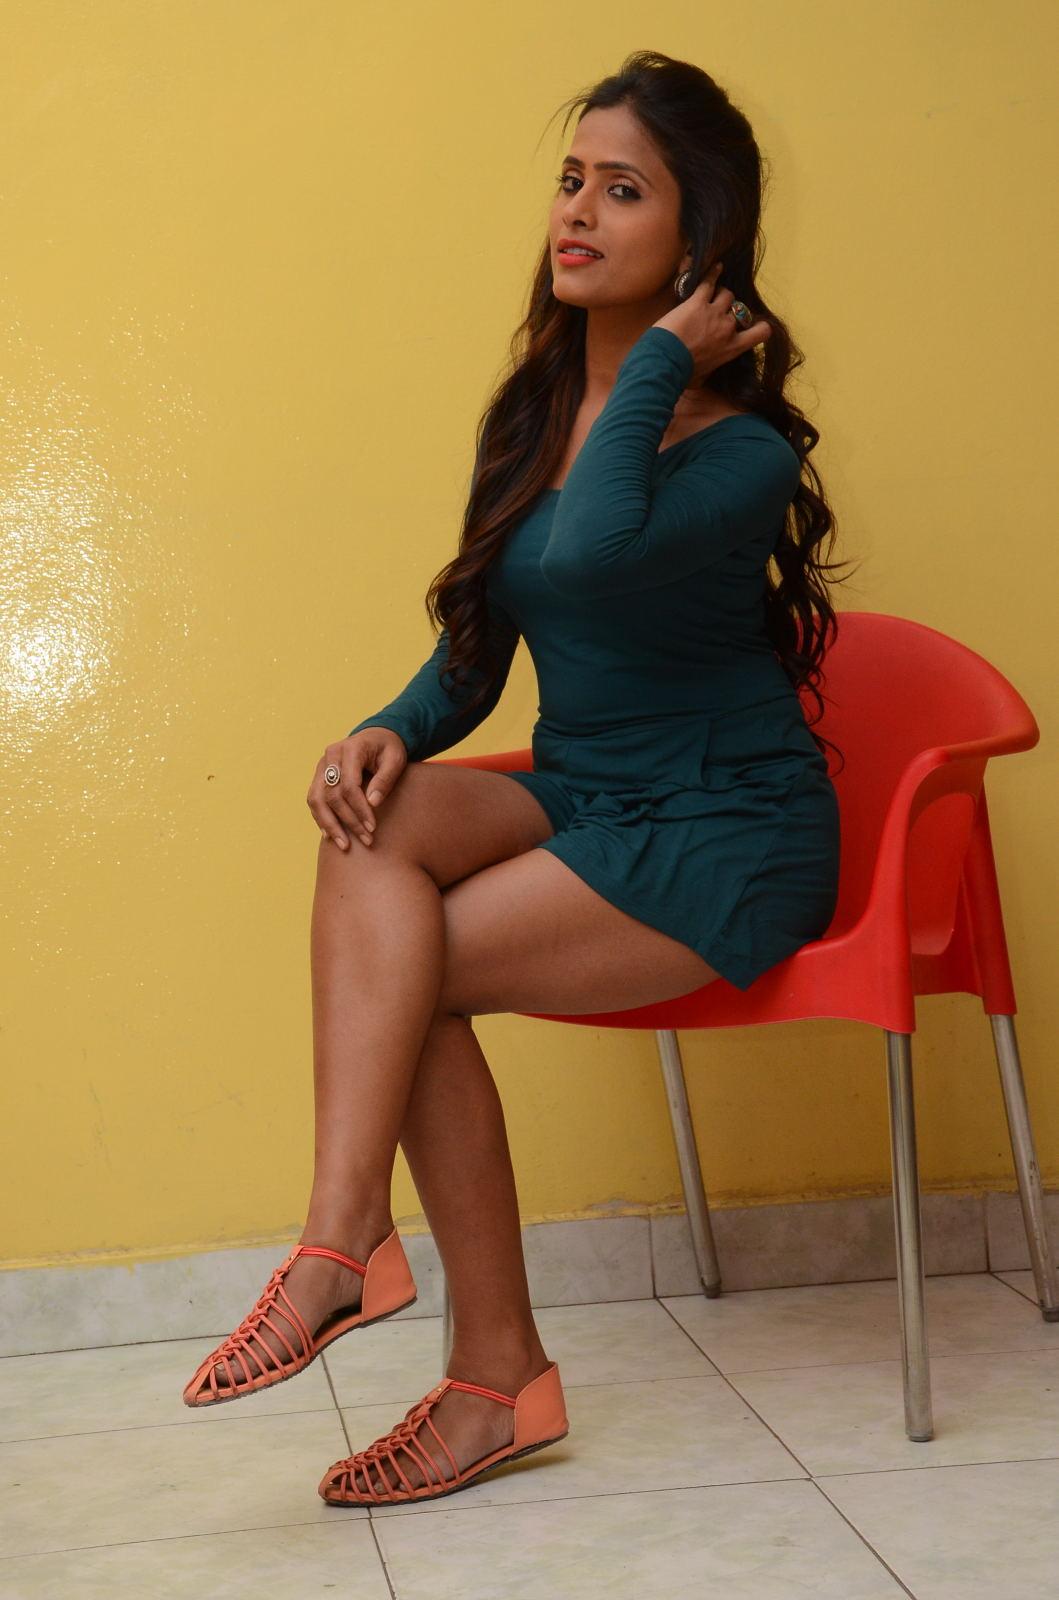 Super Hot Prashanthi In Sexy Outfit  Indian Cinema  Models  Actress-5957